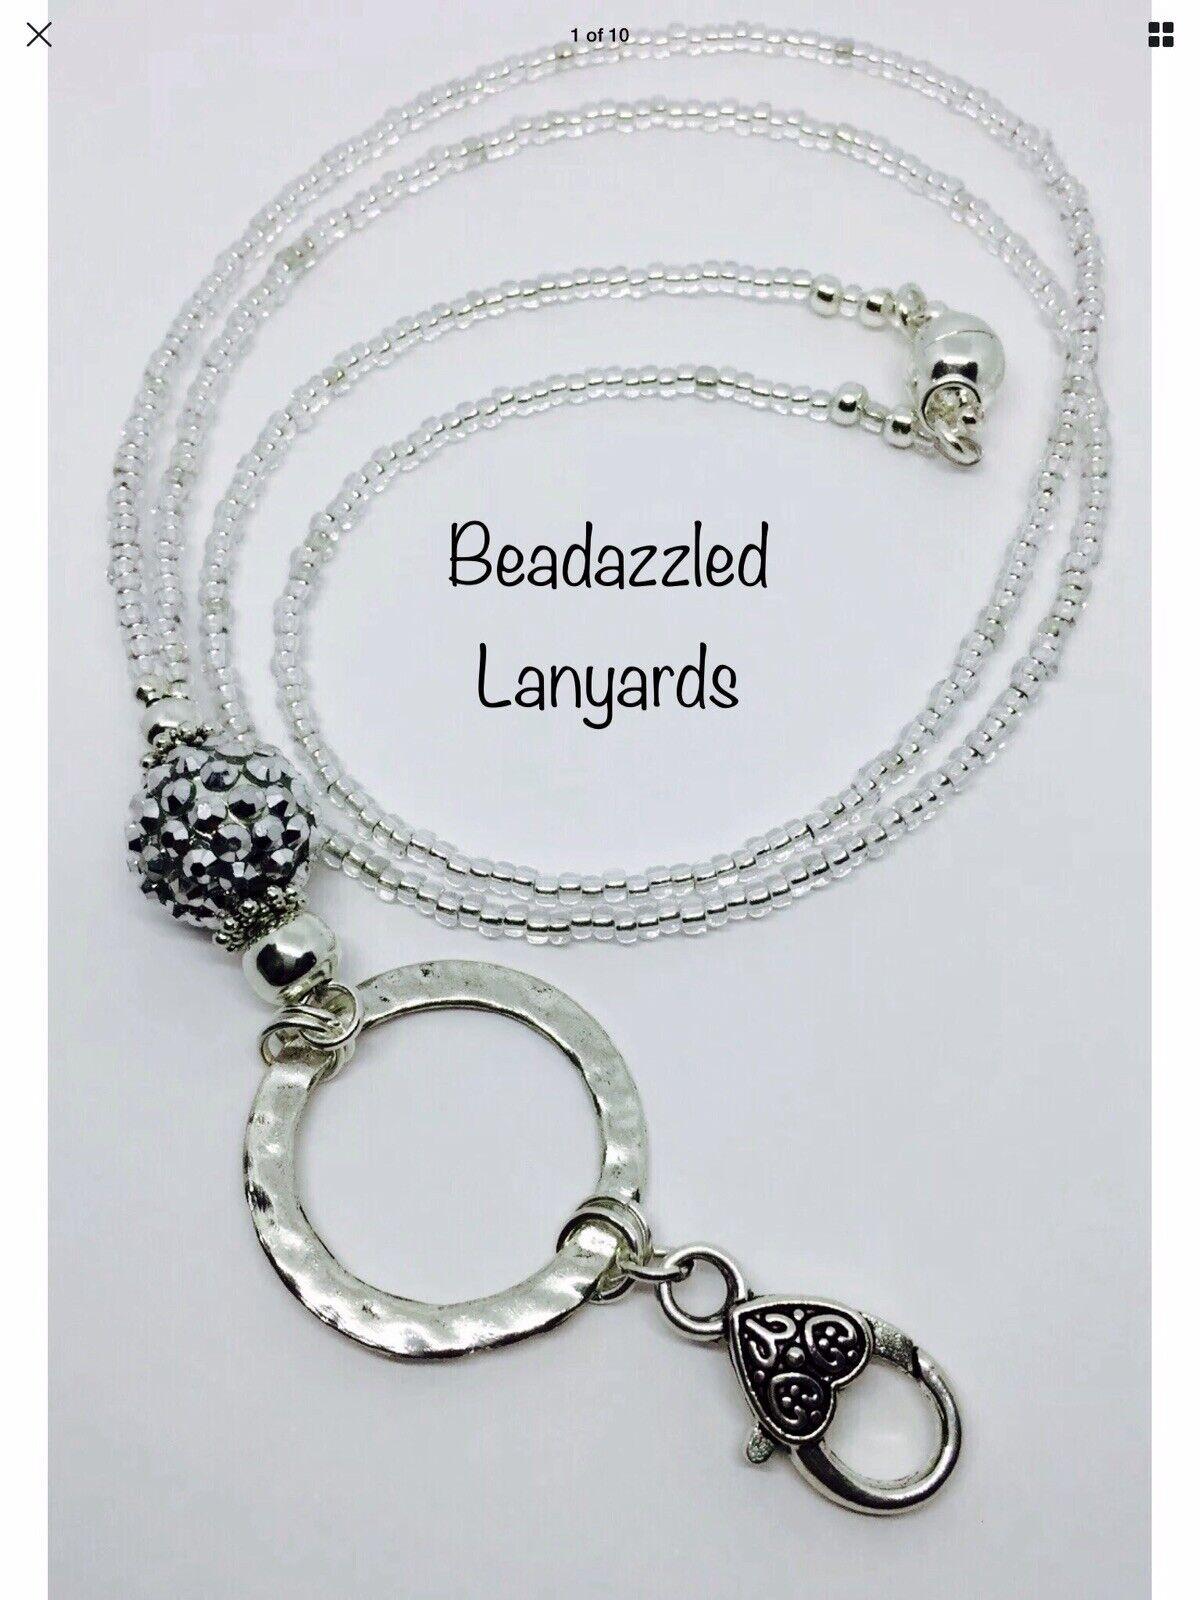 Beaded Lanyard Extra Long Or Short Lanyard,Made To Measure Lanyard ID Pass, L3